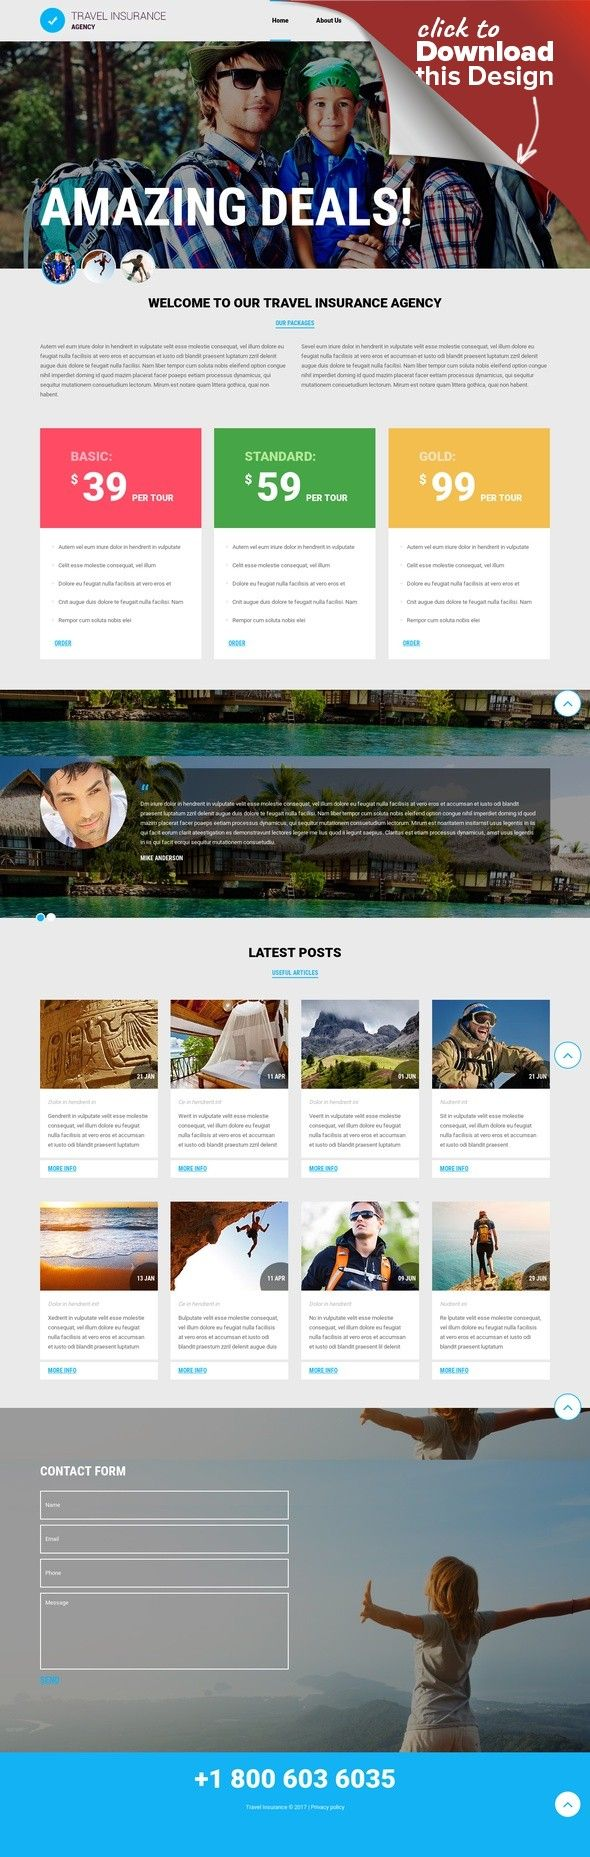 Travel Agency Responsive Joomla Template CMS & Blog Templates, Joomla Templates, Sports, Outdoors & Travel, Travel Templates, Travel Agency Templates